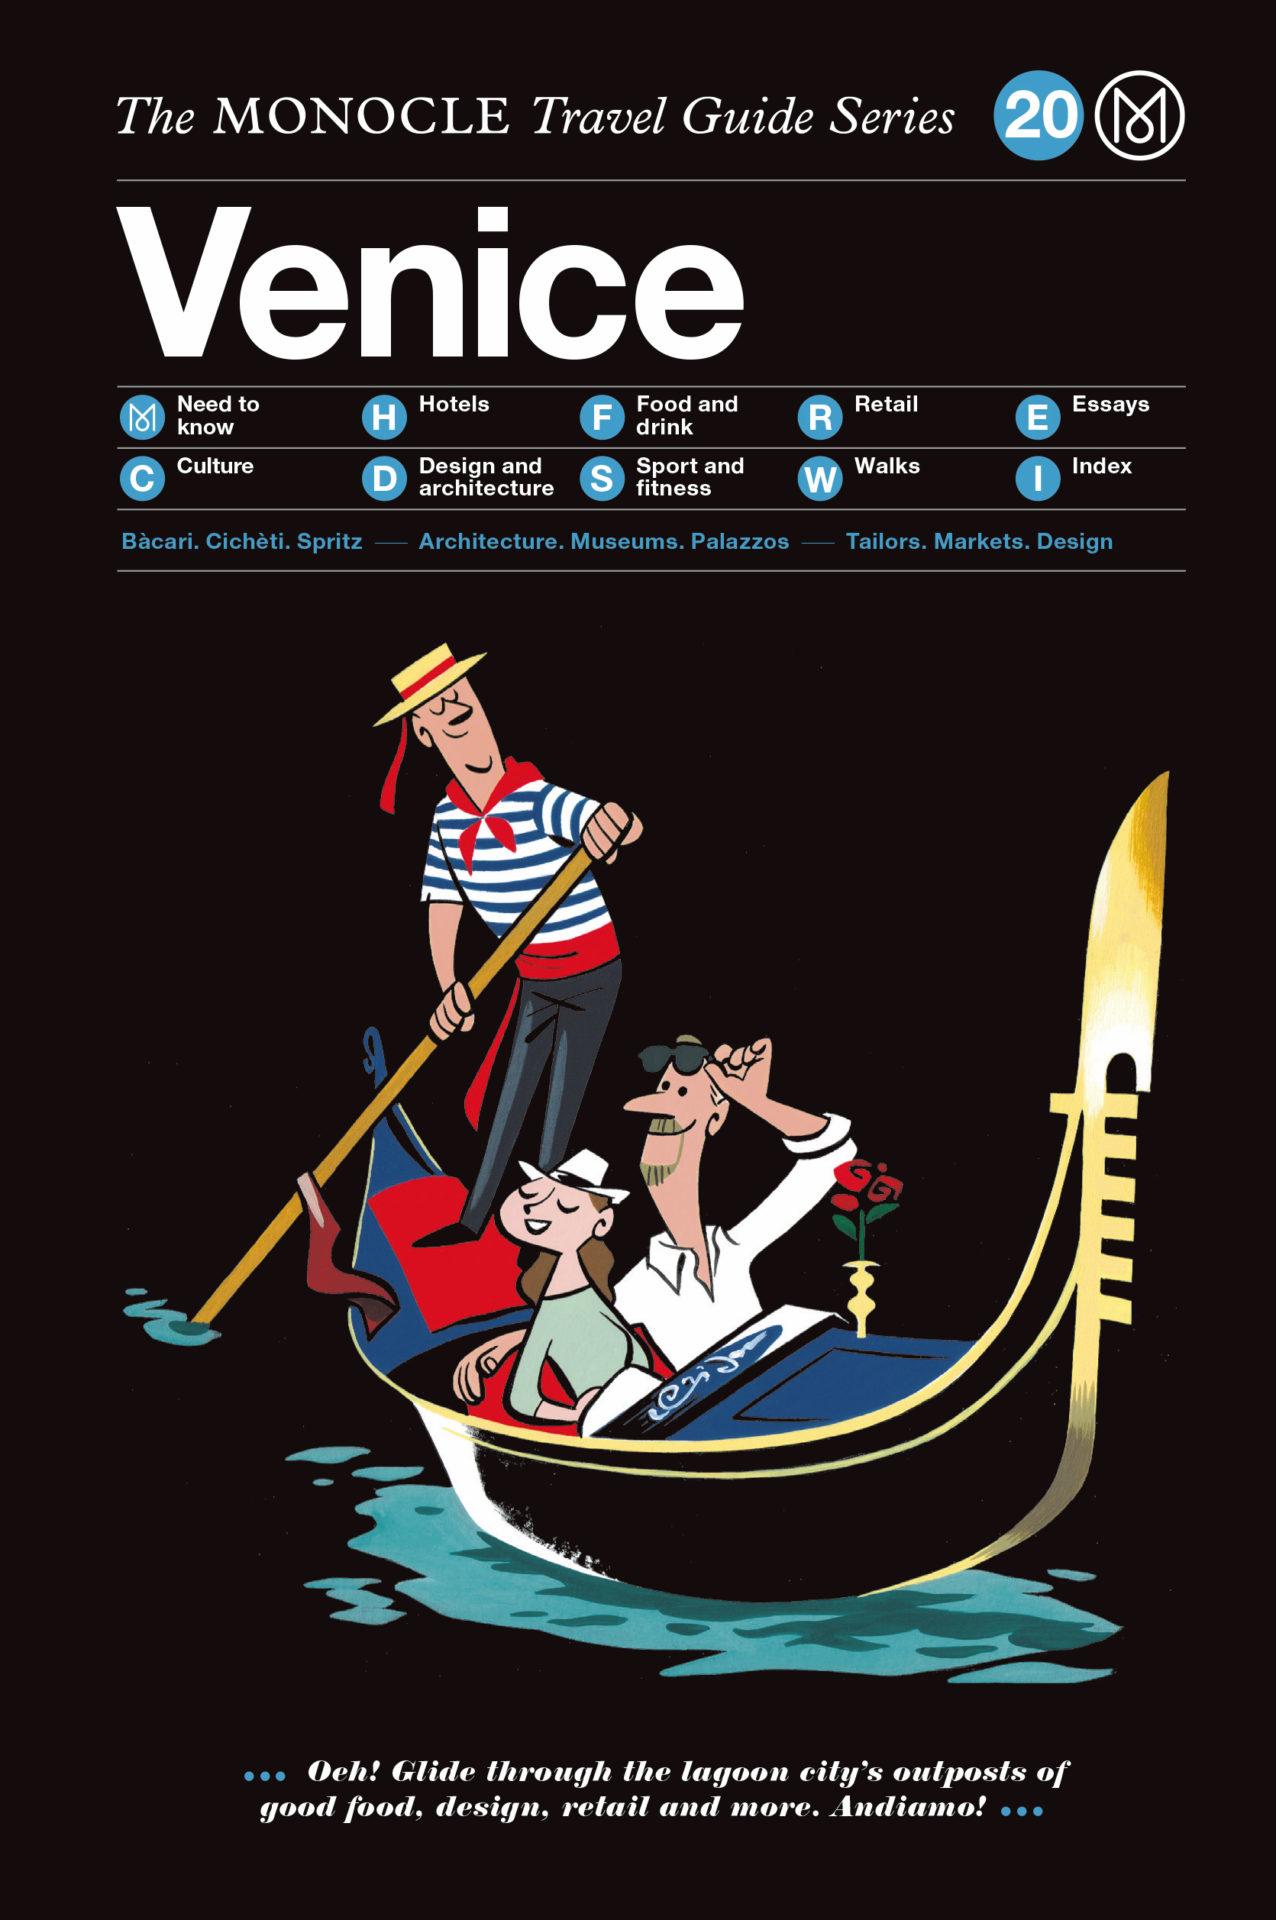 Venice Monocle Travel Guide